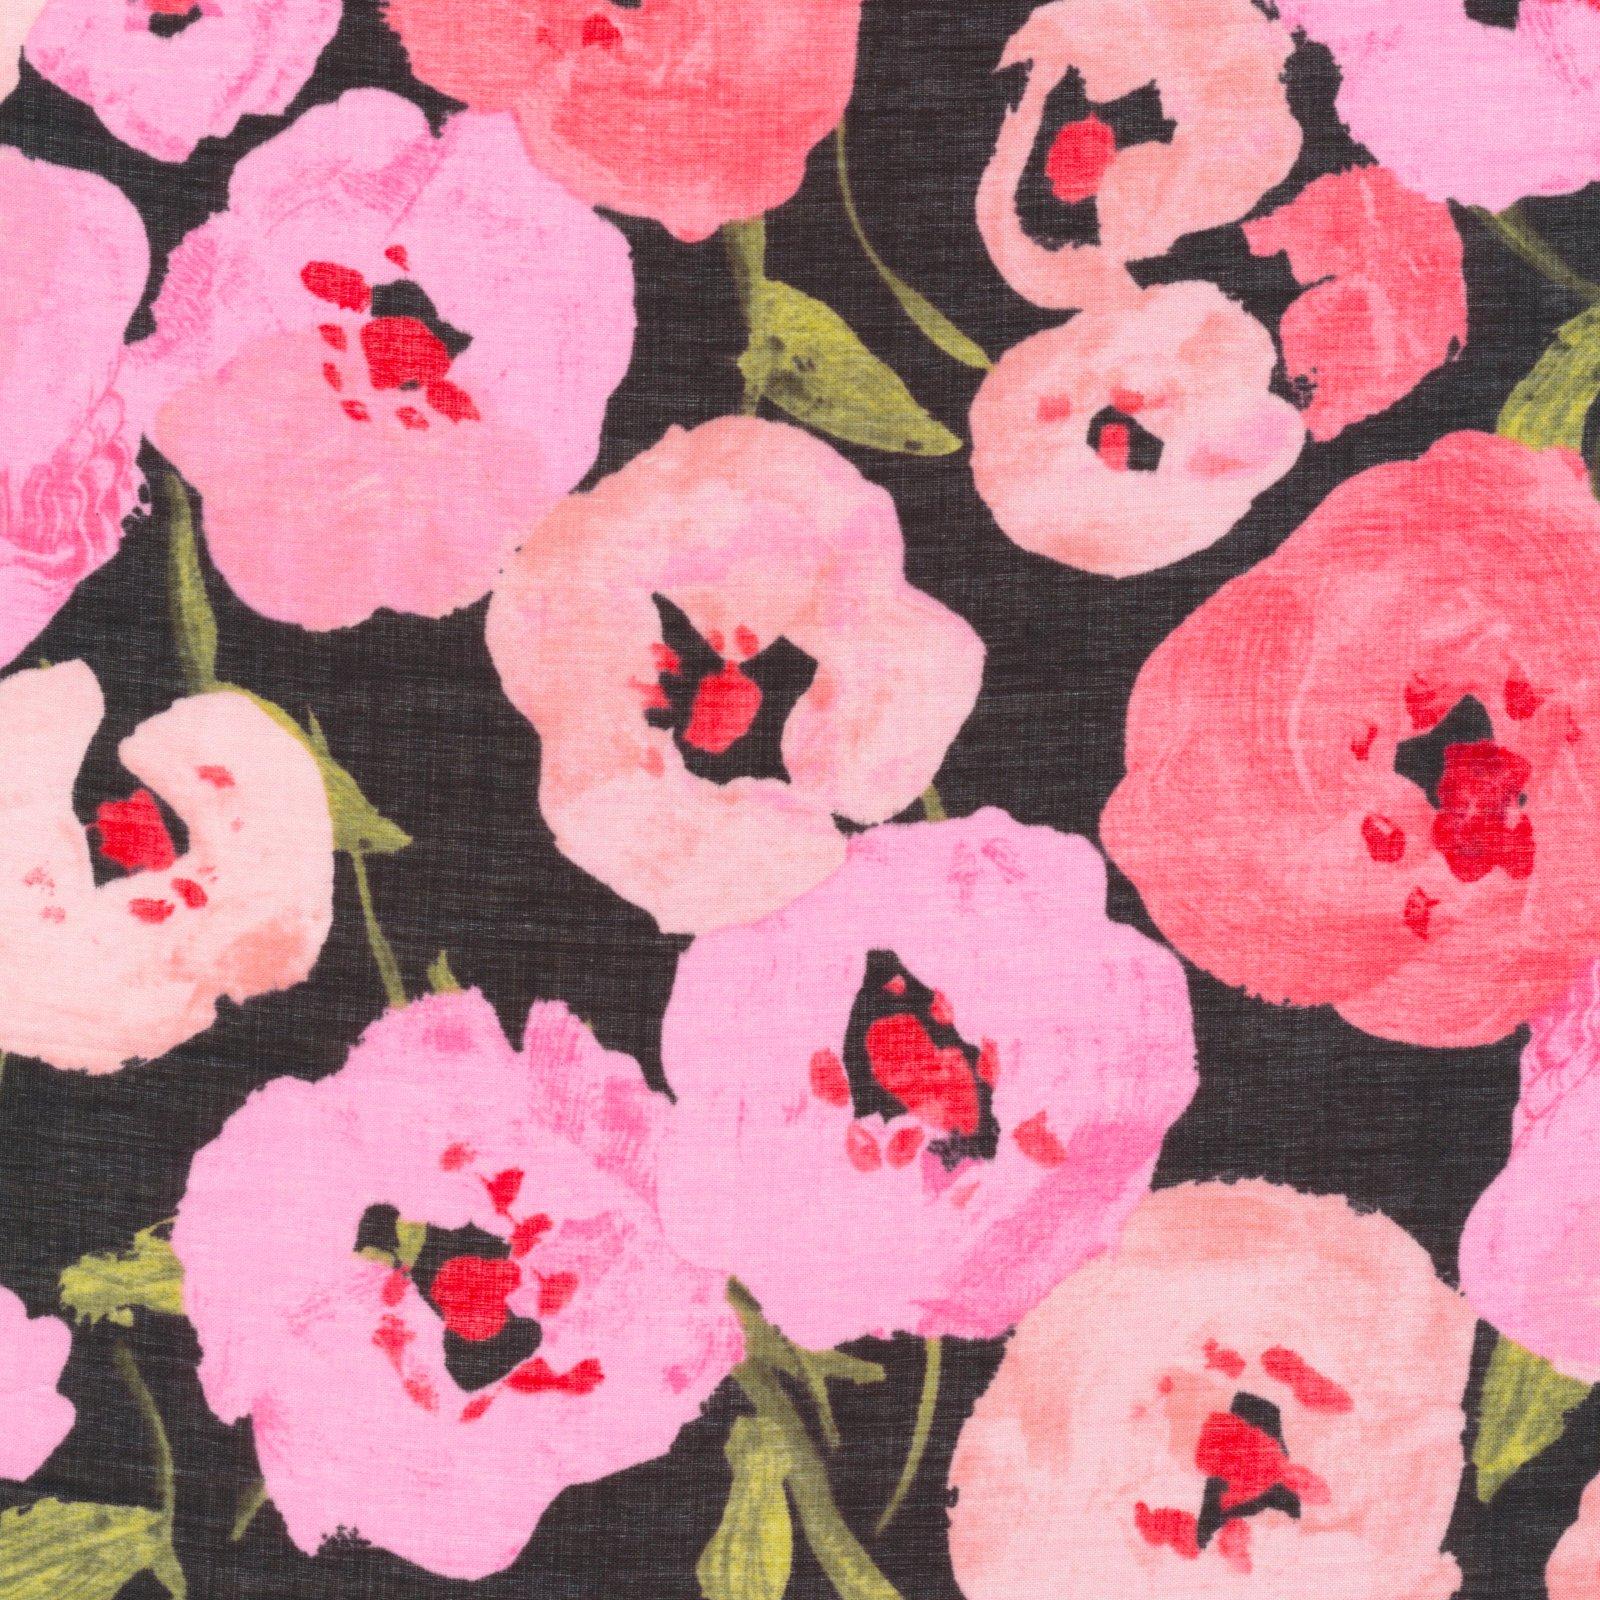 Cloud 9 Lush - Pink Poppies - 217301